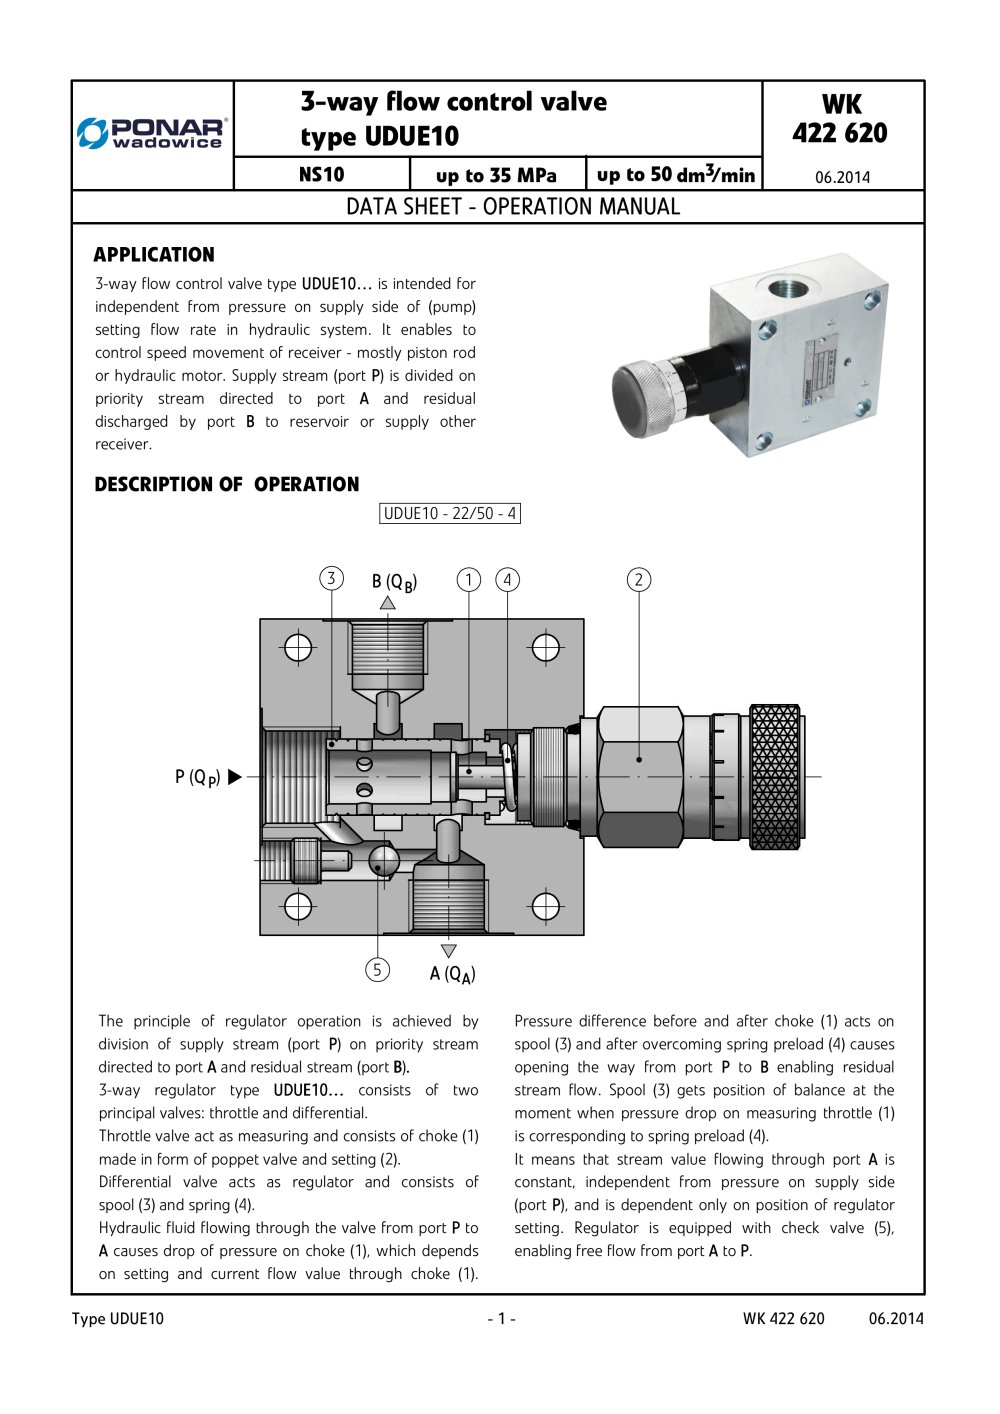 3 way flow control valve type udue10 ponar s a pdf catalogs Electric Hydraulic Flow Control Valve 3 way flow control valve type udue10 1 6 pages